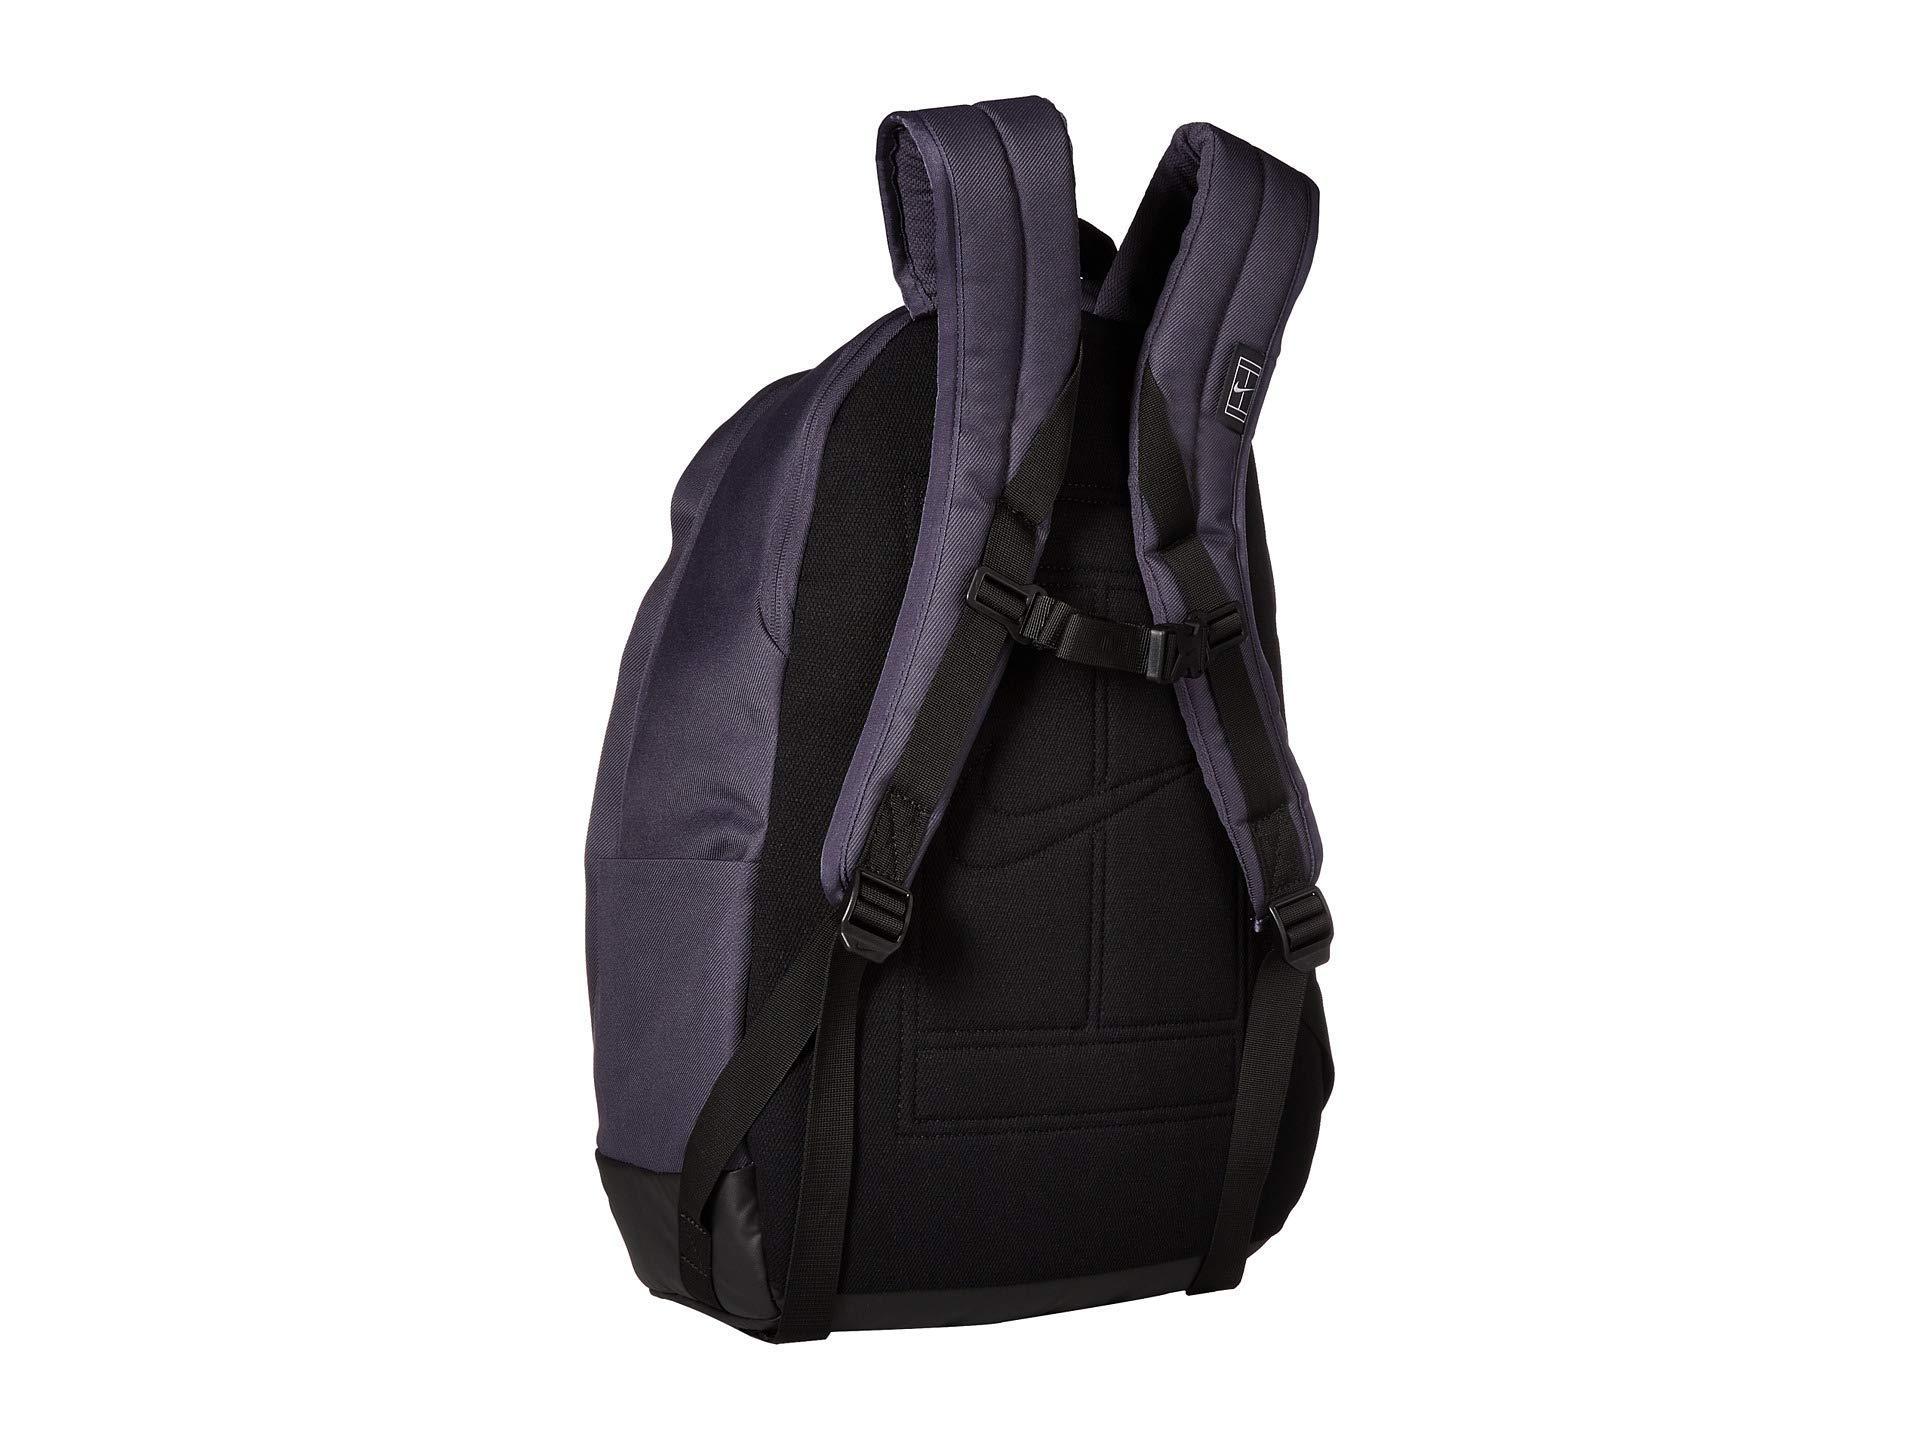 Lyst - Nike Court Advantage Tennis Backpack (black black anthracite ... f493d258ab0bd